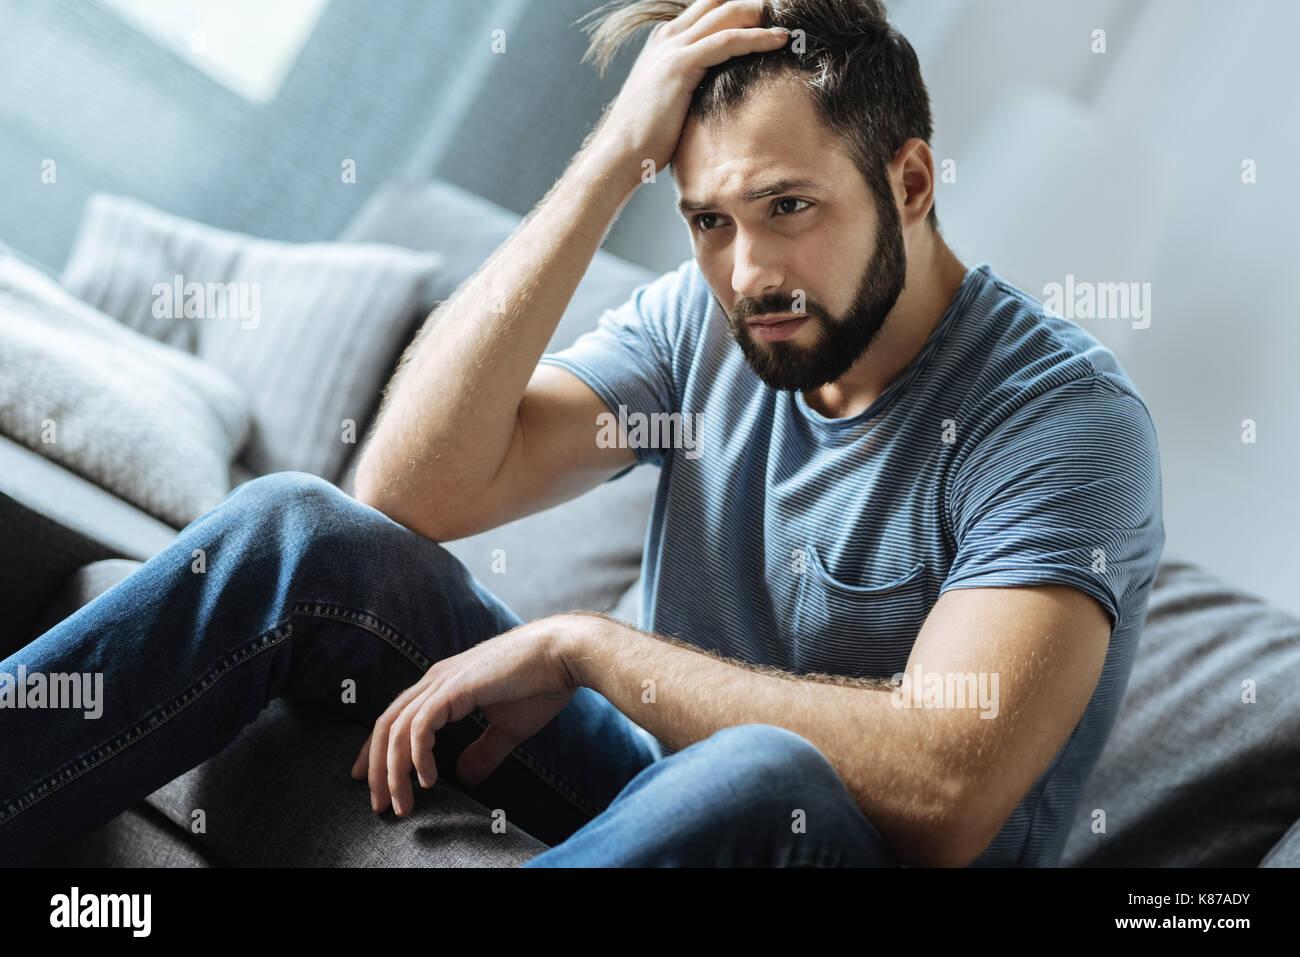 Cheerless moody man being alone - Stock Image